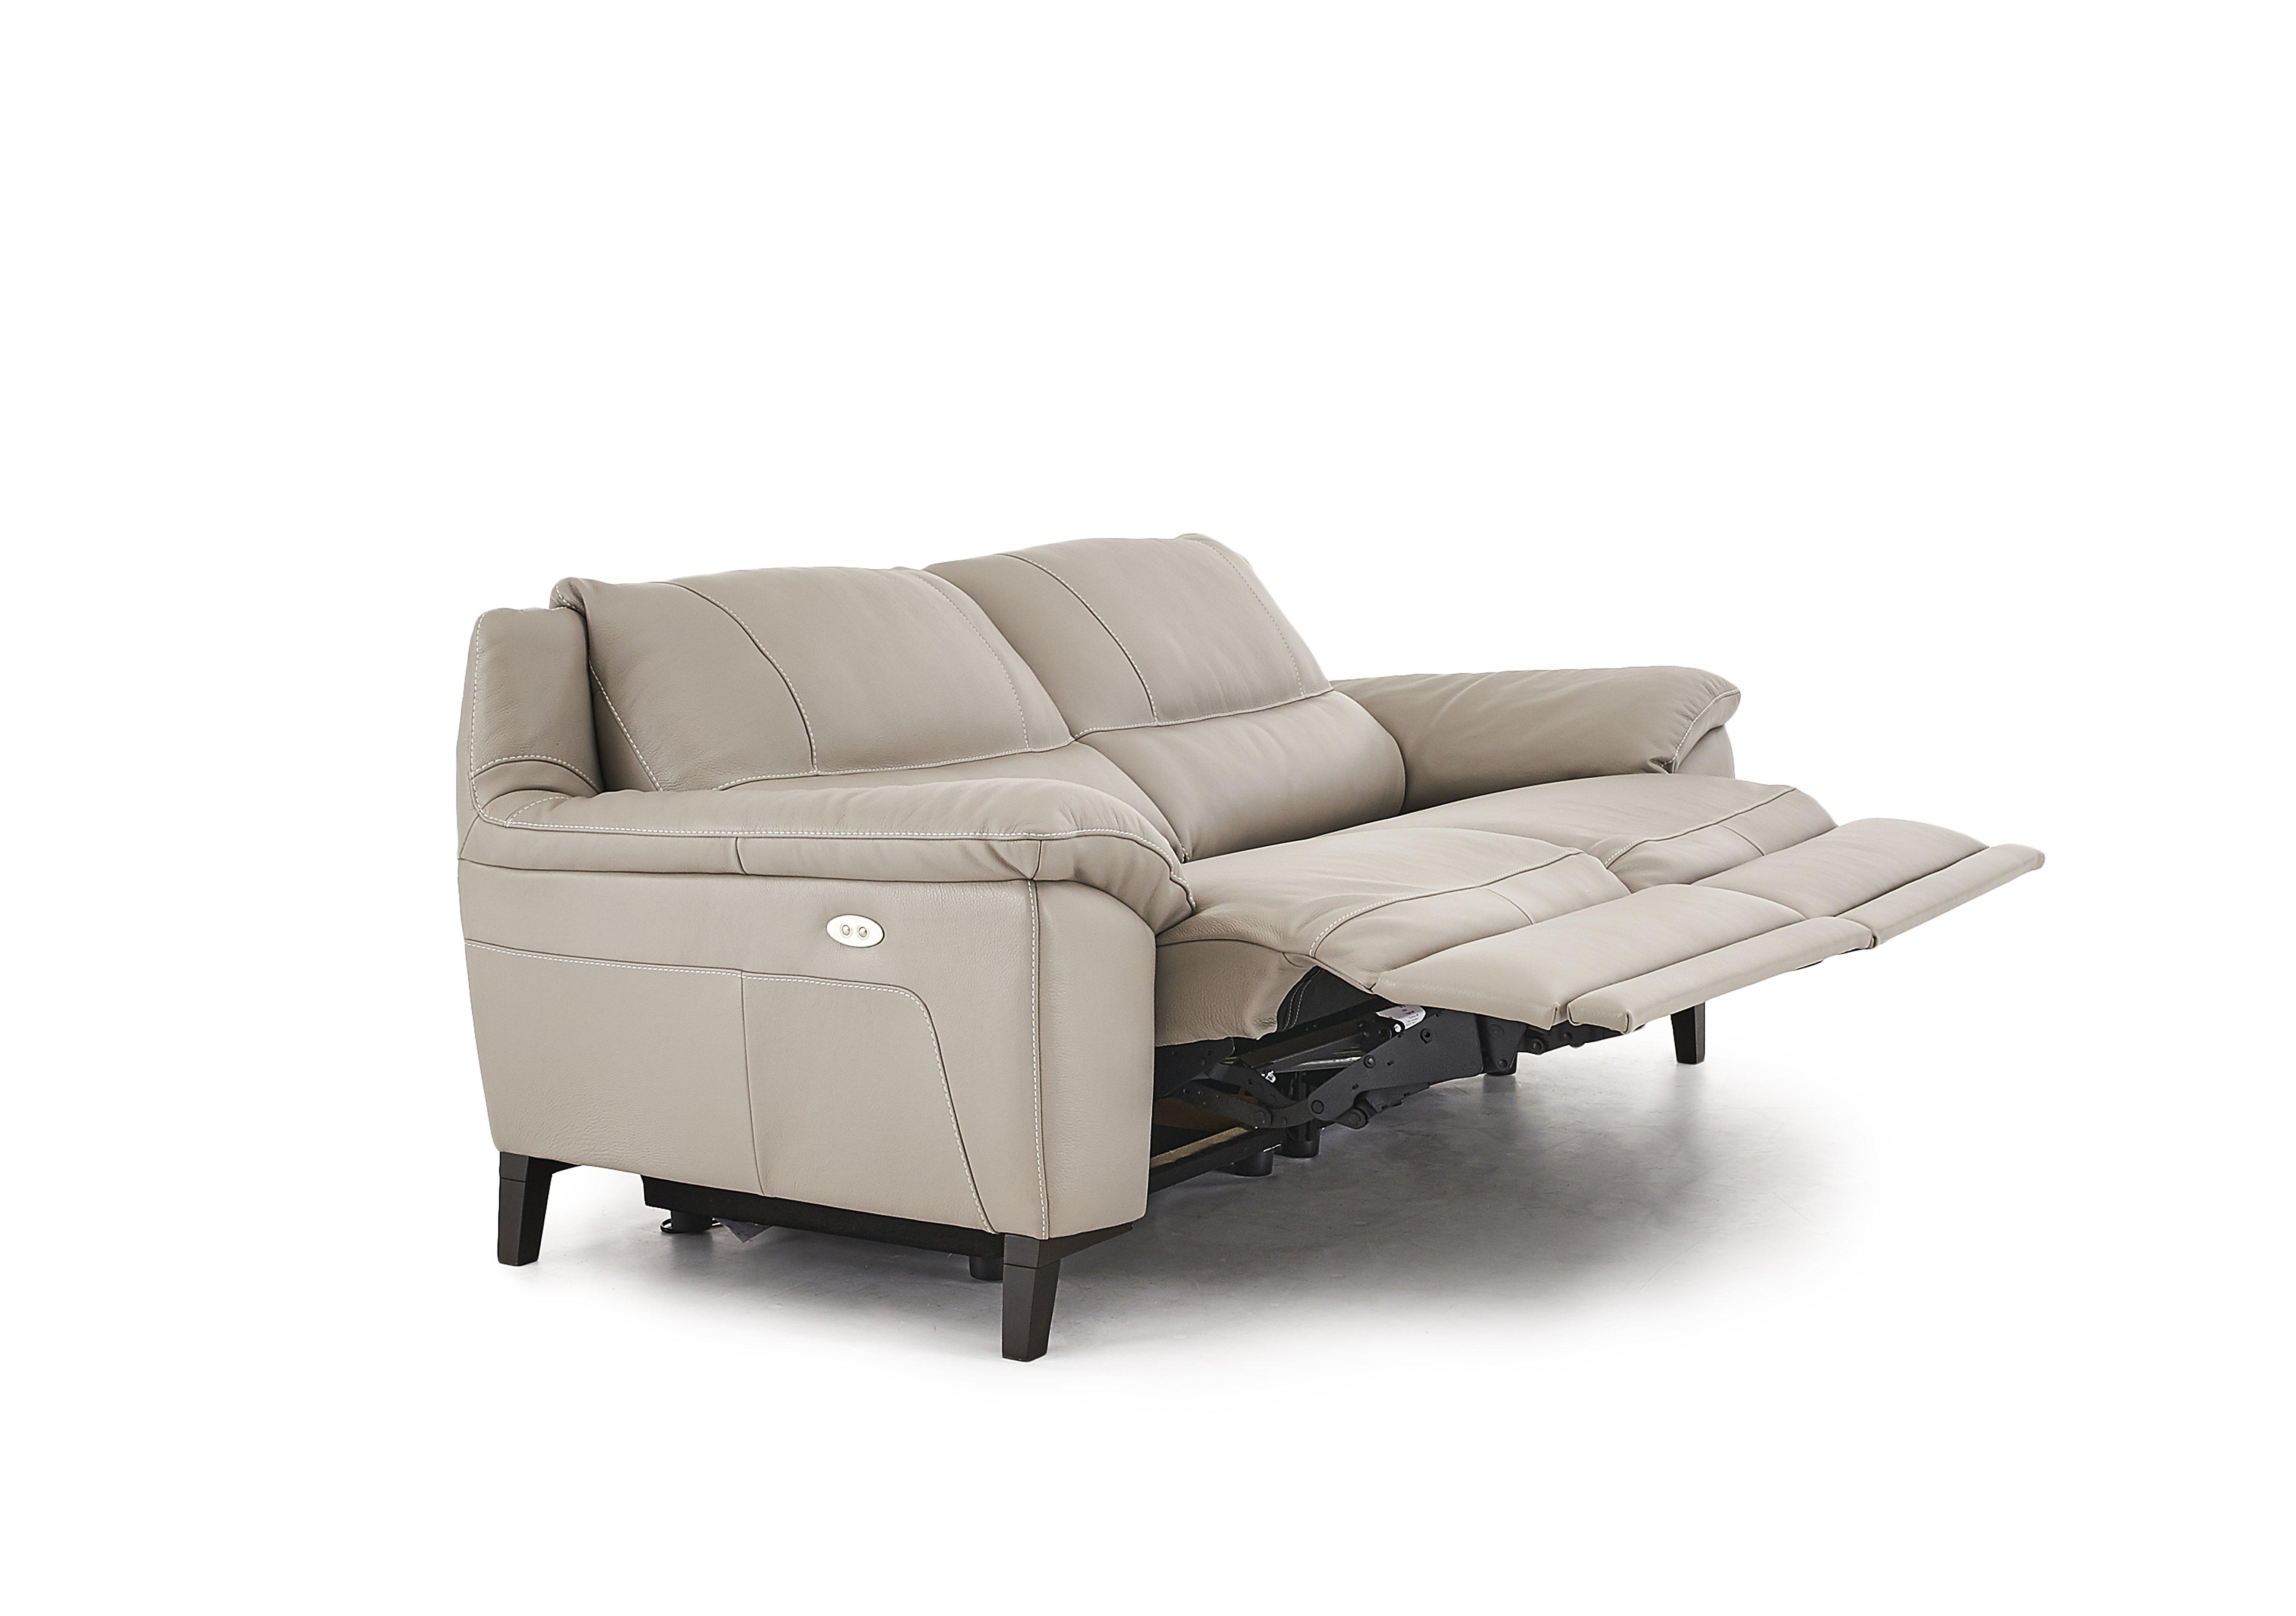 Puglia 2 5 Seater Leather Recliner Sofa Natuzzi Editions